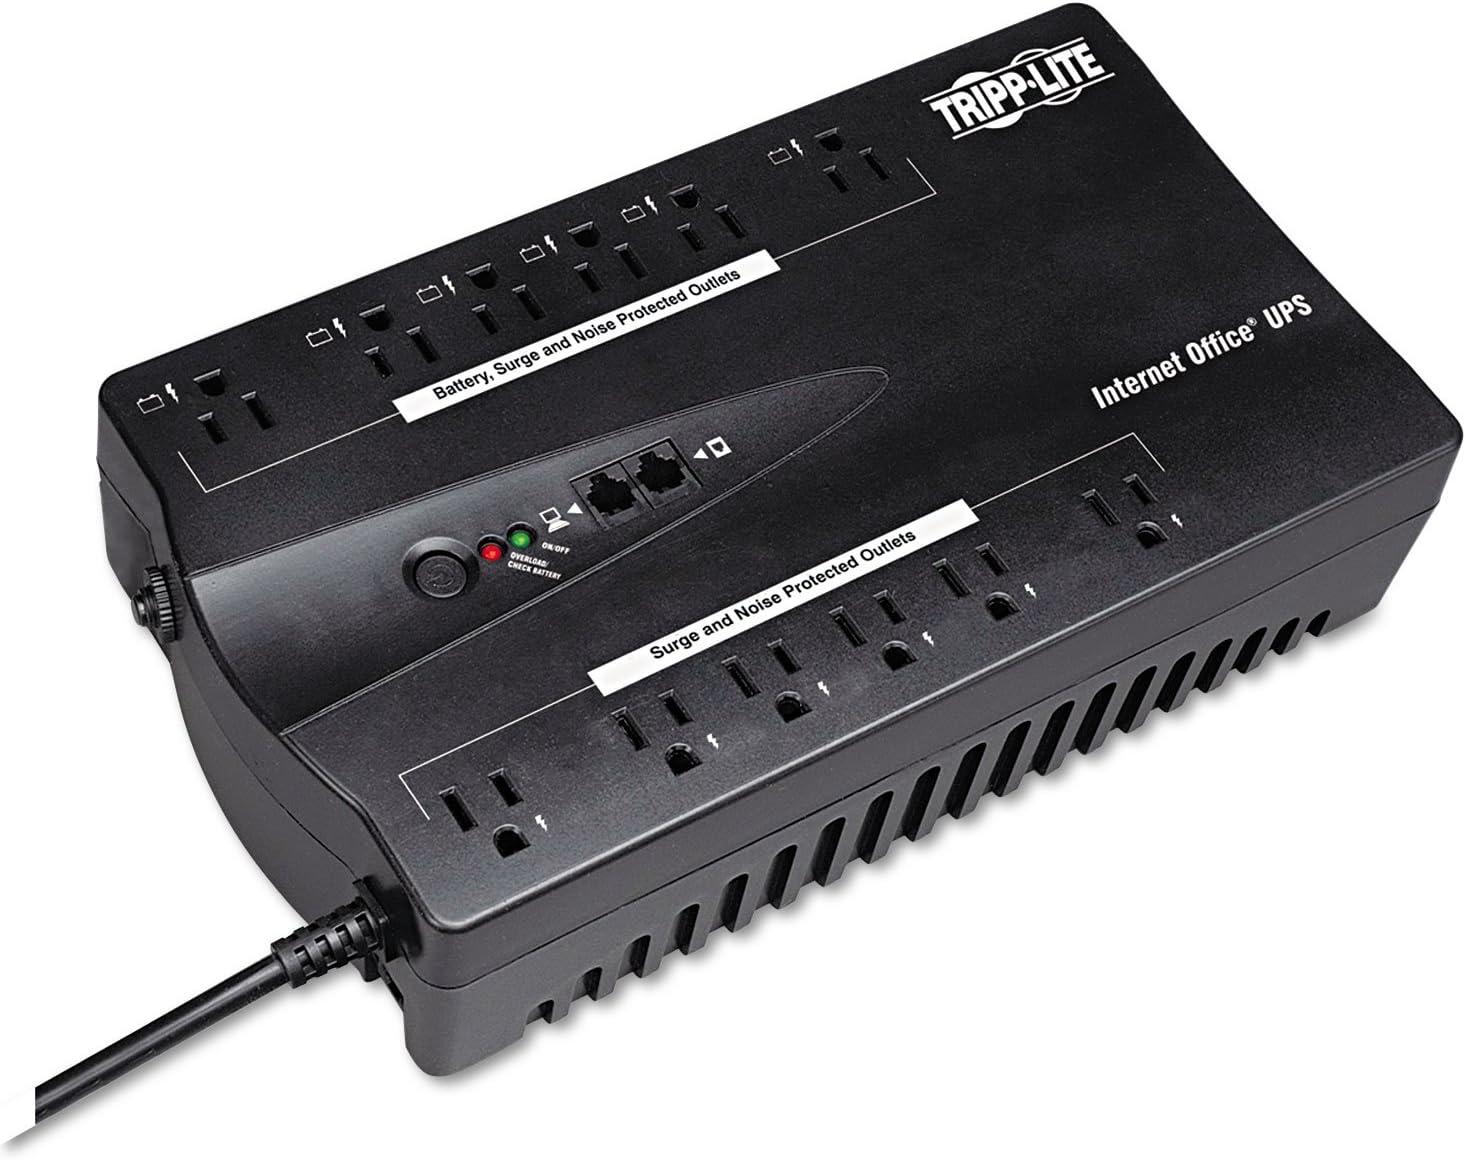 Tripp Lite UPS 900VA 480W Desktop Battery Back Up Compact 120V USB RJ11 PC